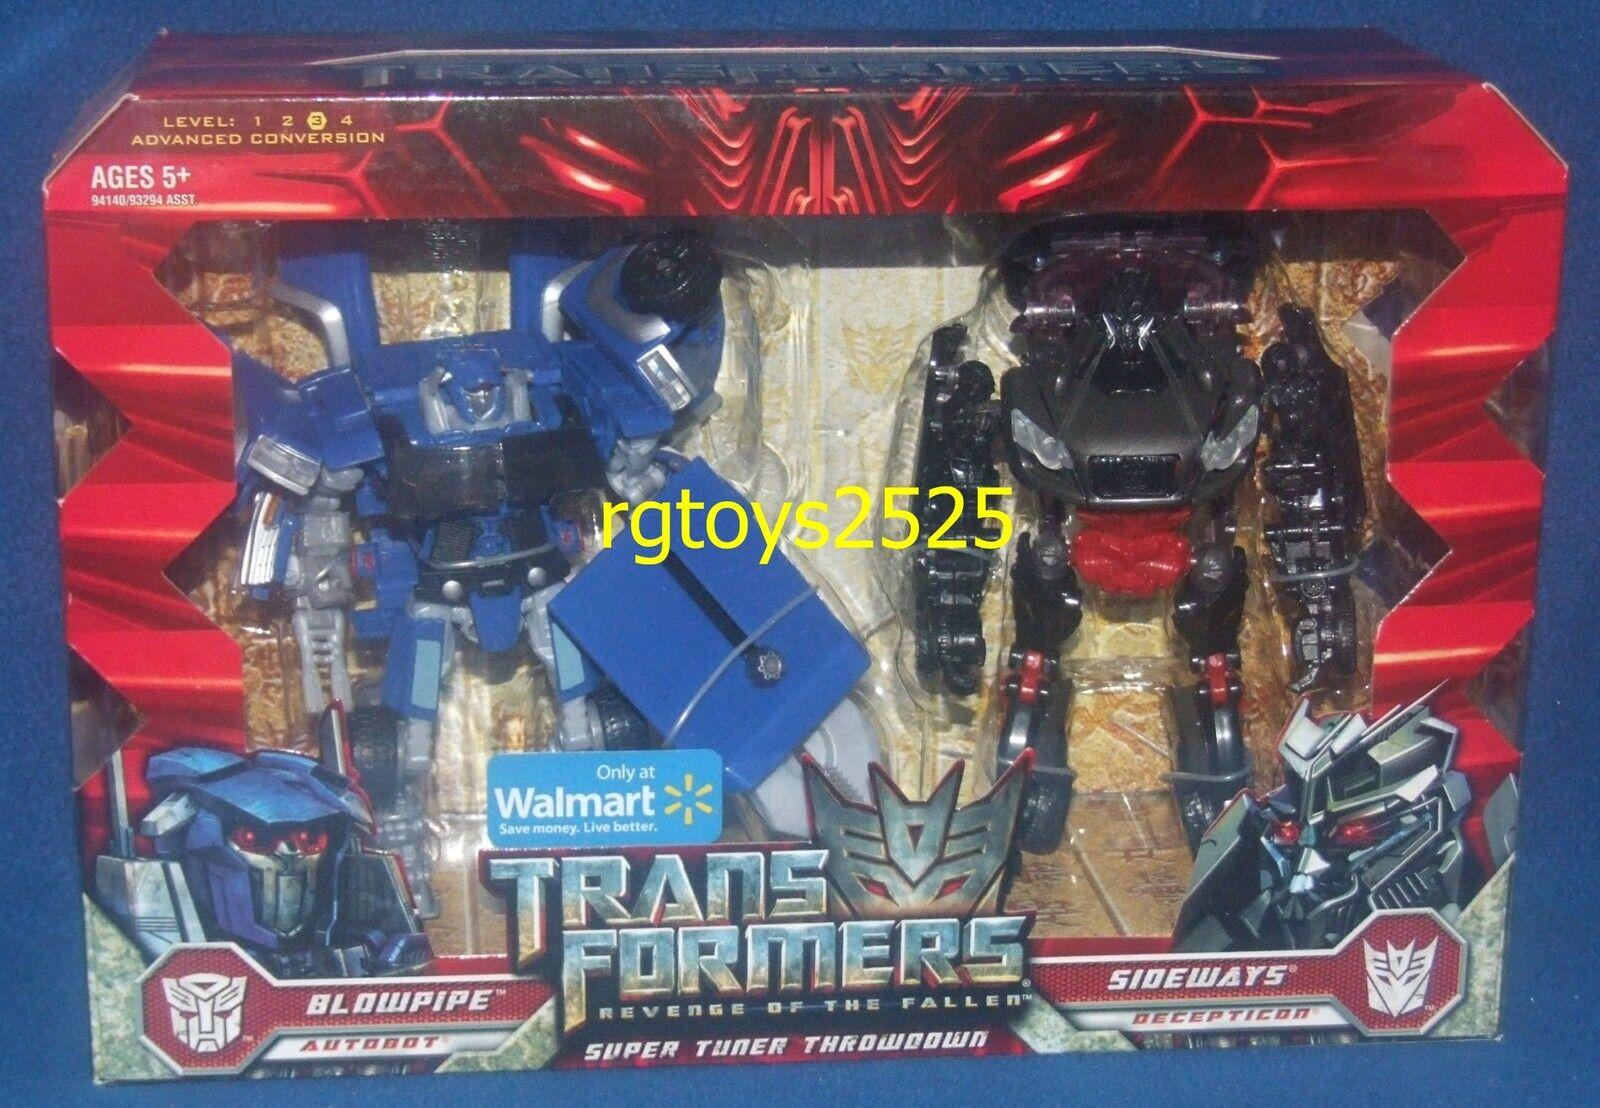 Transformers Revenge of the  Fallen Chalumeau Sideways nouveau Super Tuner Throwdown  vente en ligne